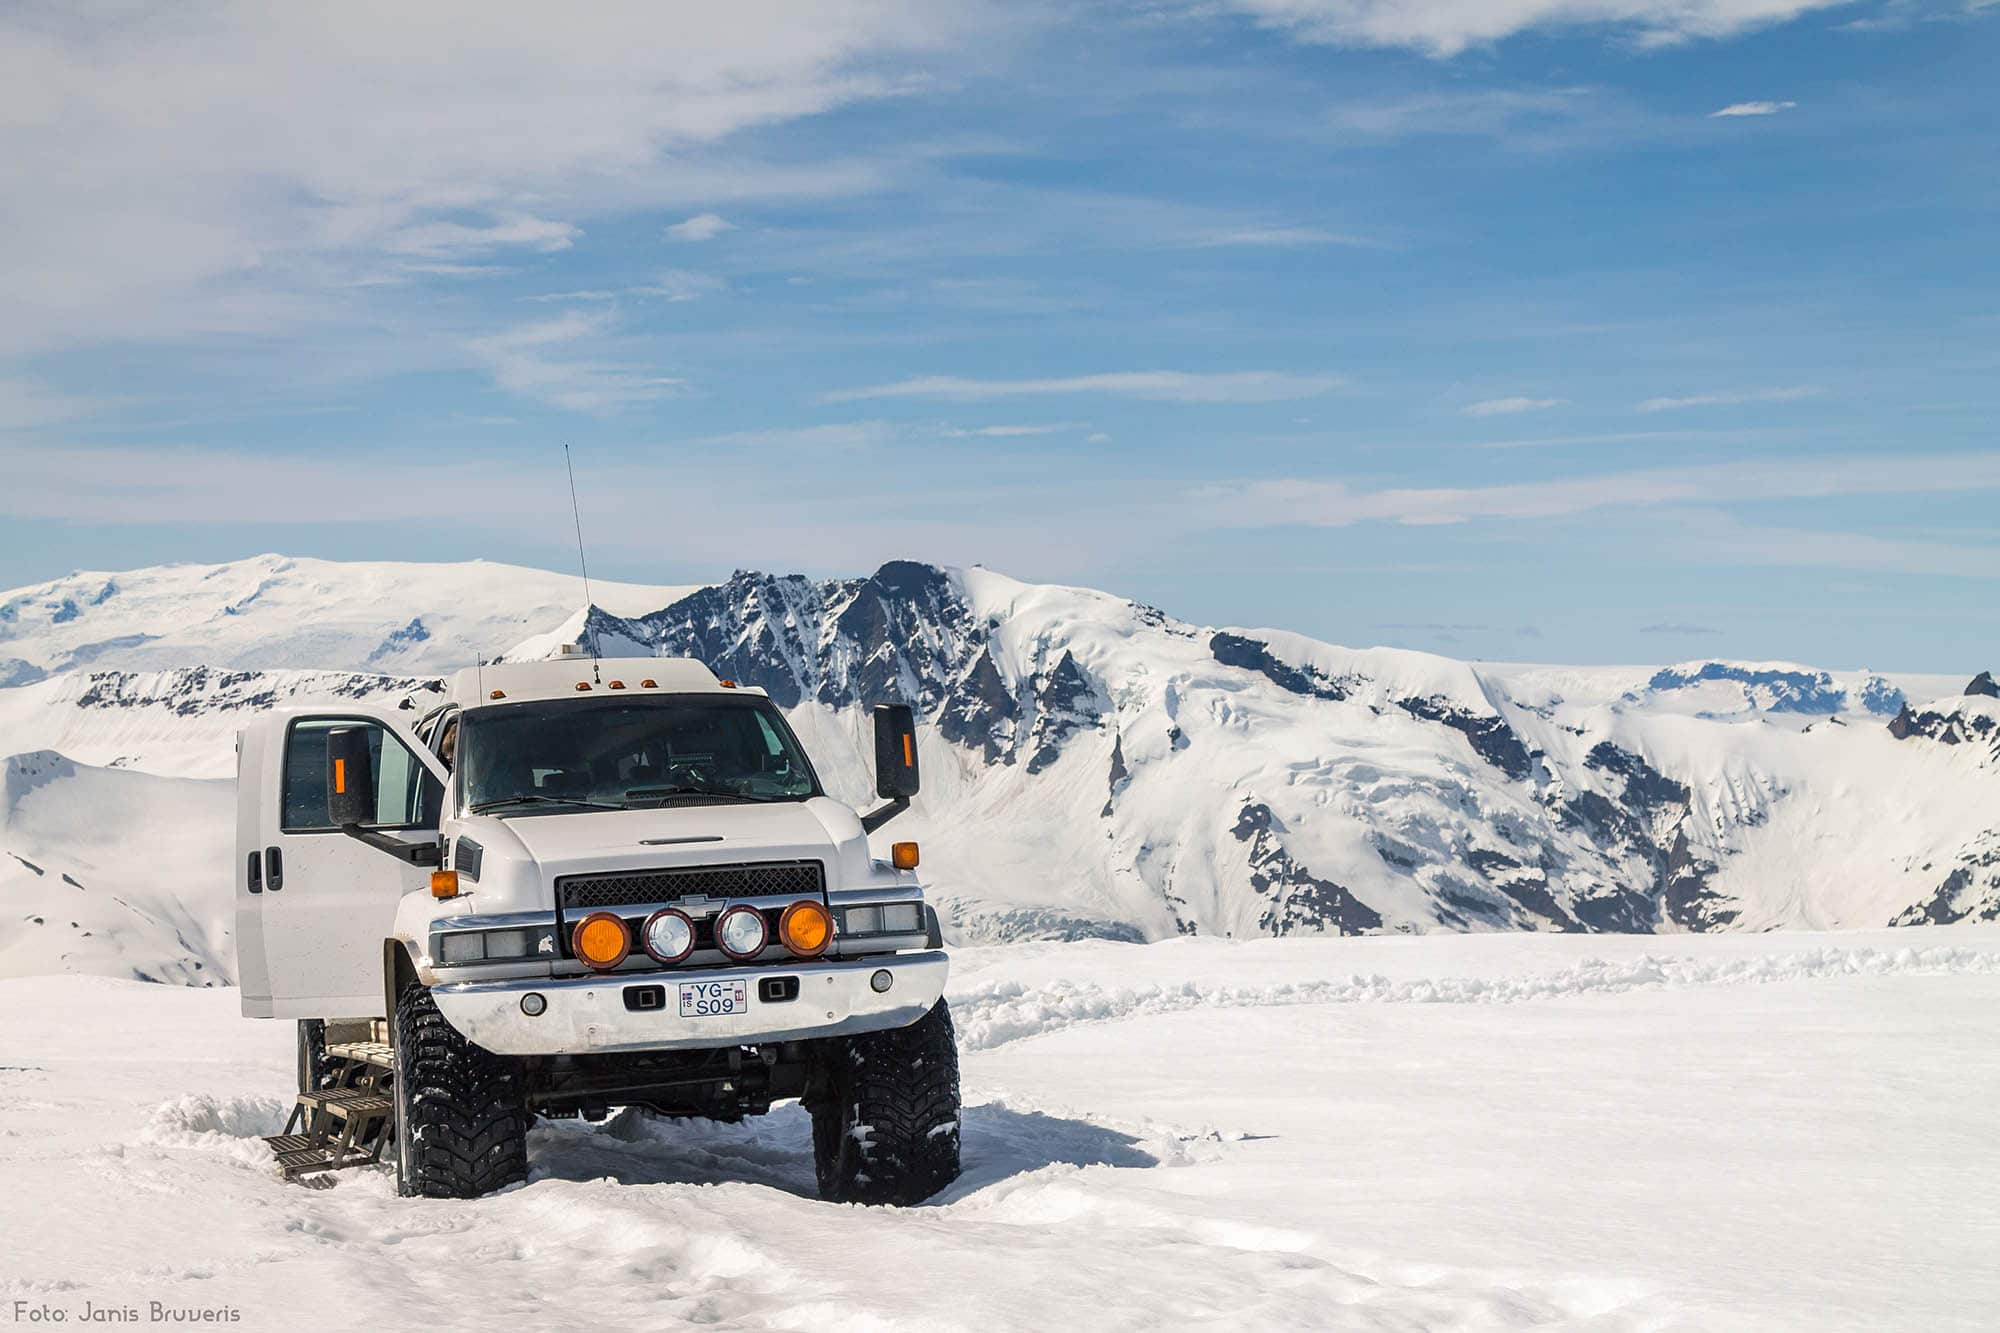 iceland super jeep tour on a glacier - photo by janis bruveris